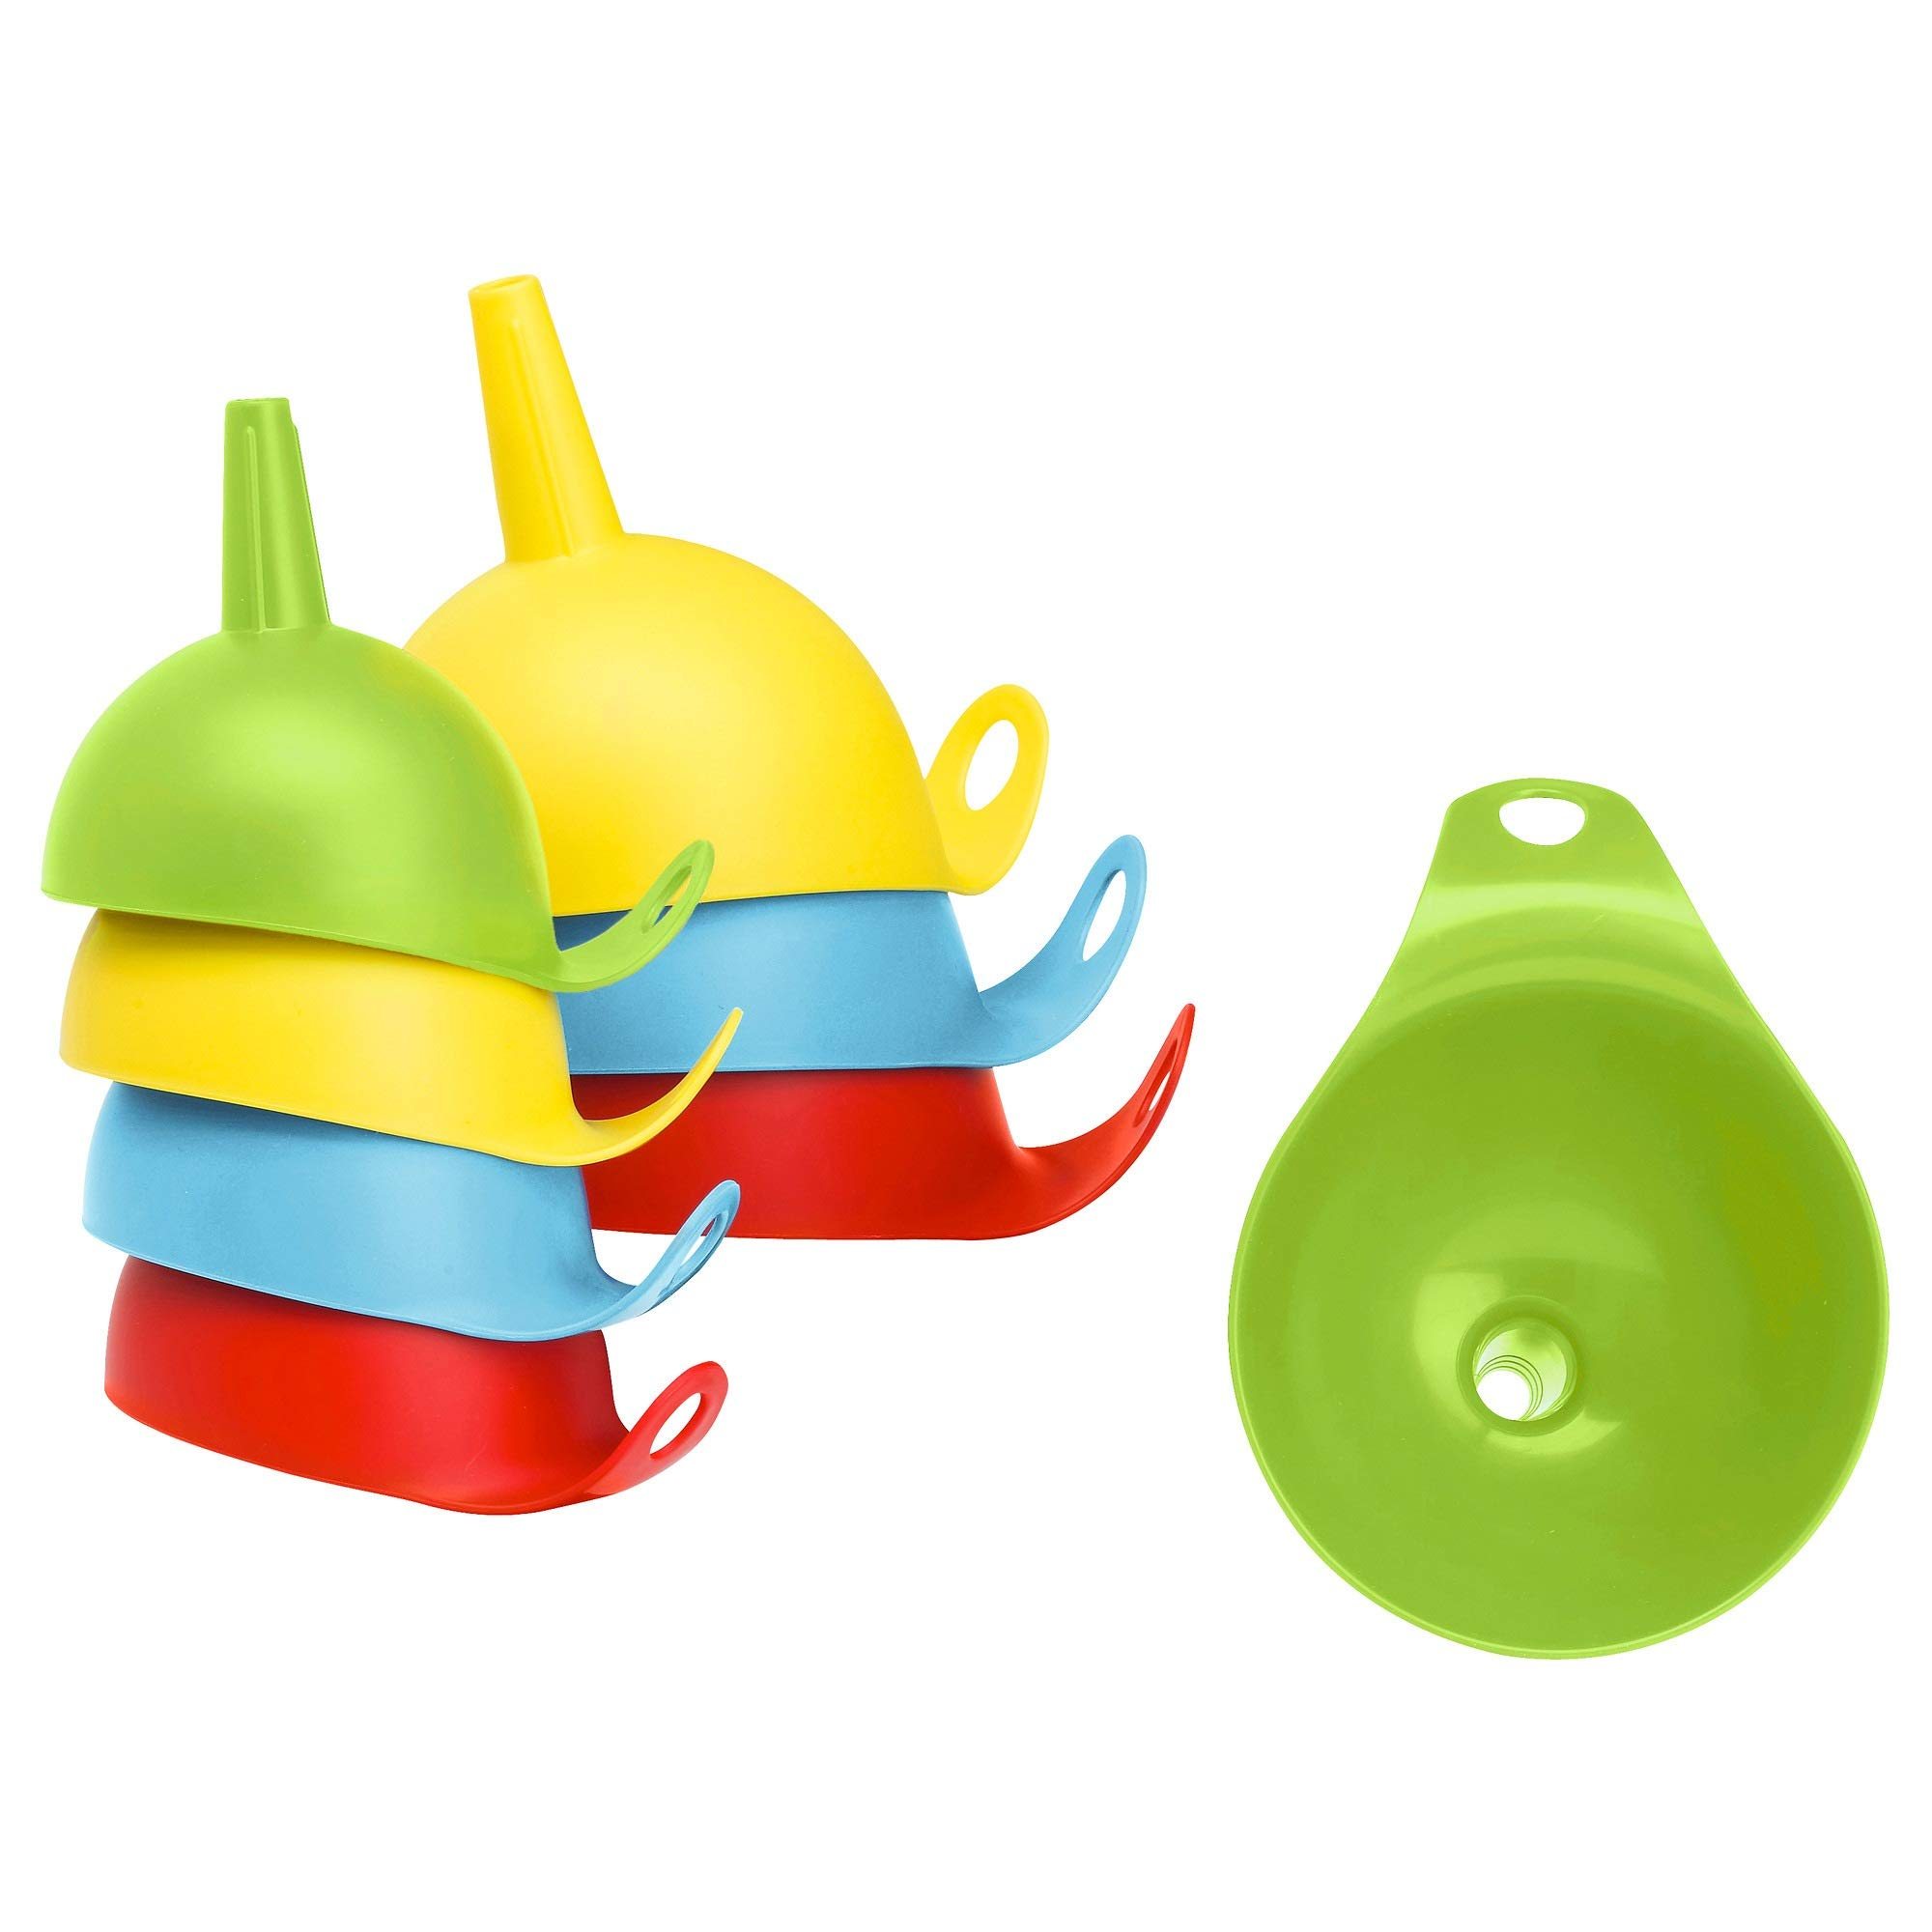 IKEA 701.531.79 Chosigt Funnel, Set Of 2, Assorted Colors